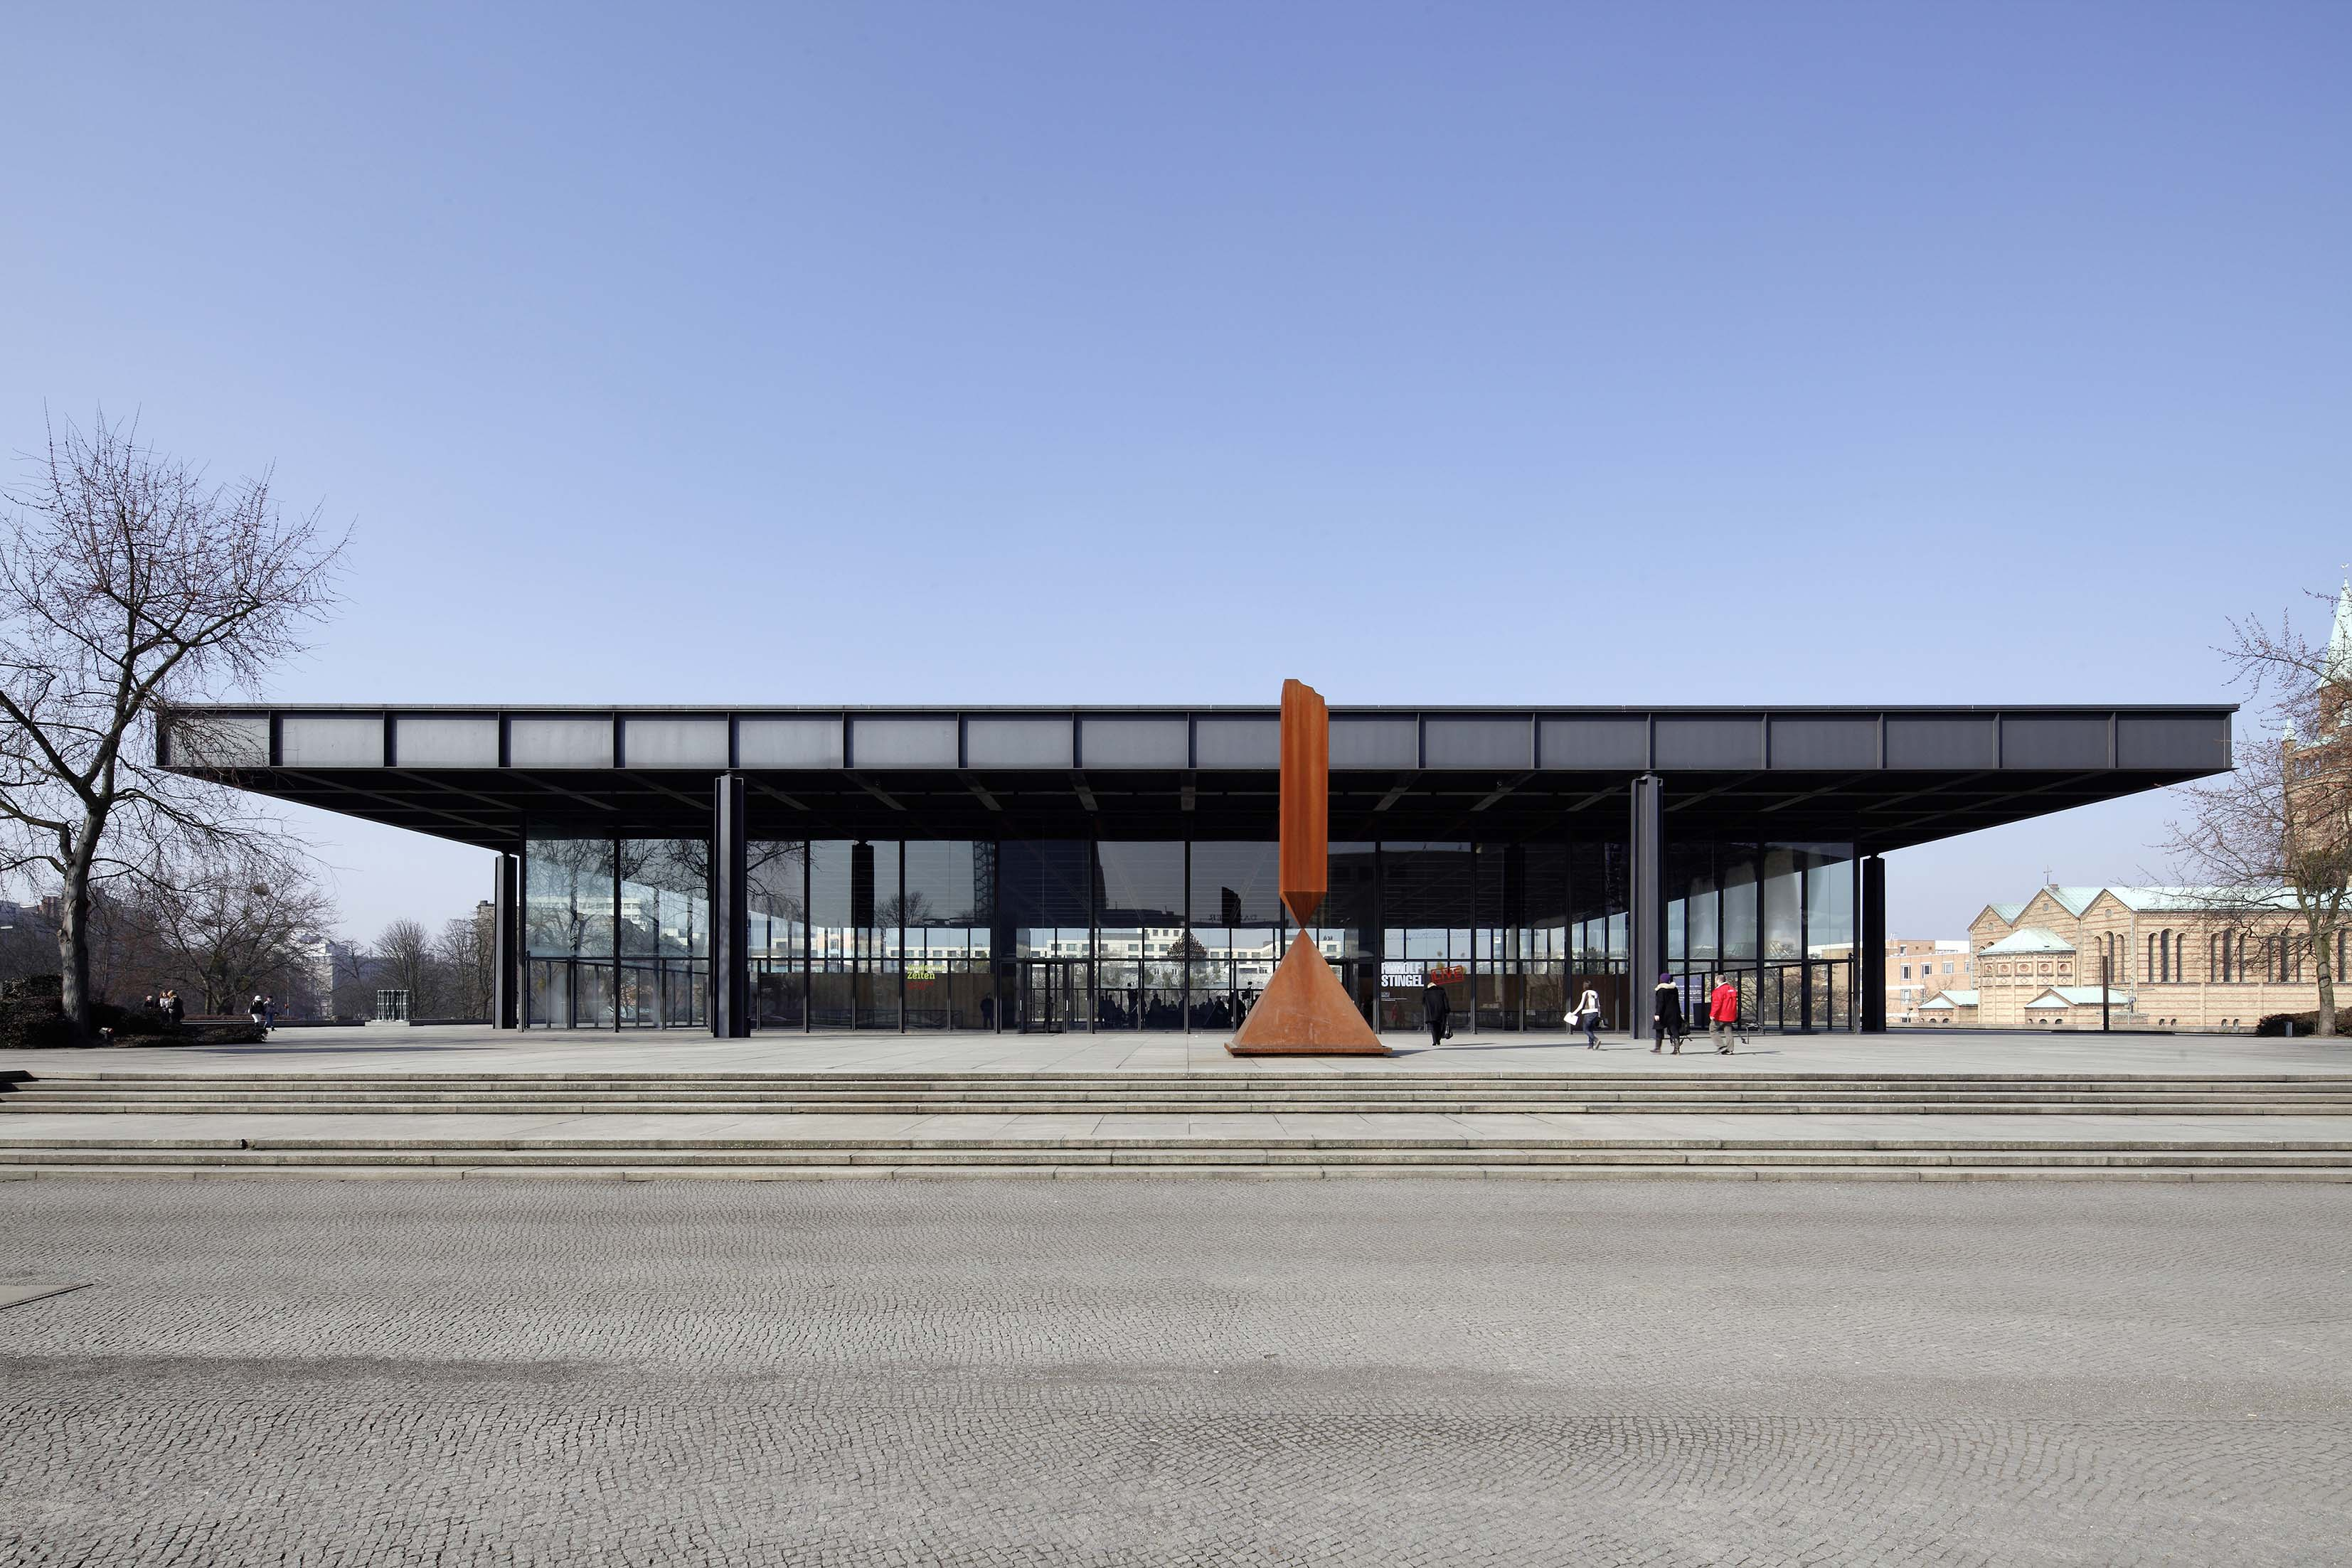 Neue Nationalgalerie © Staatliche Museen zu Berlin / Maximilian Meisse